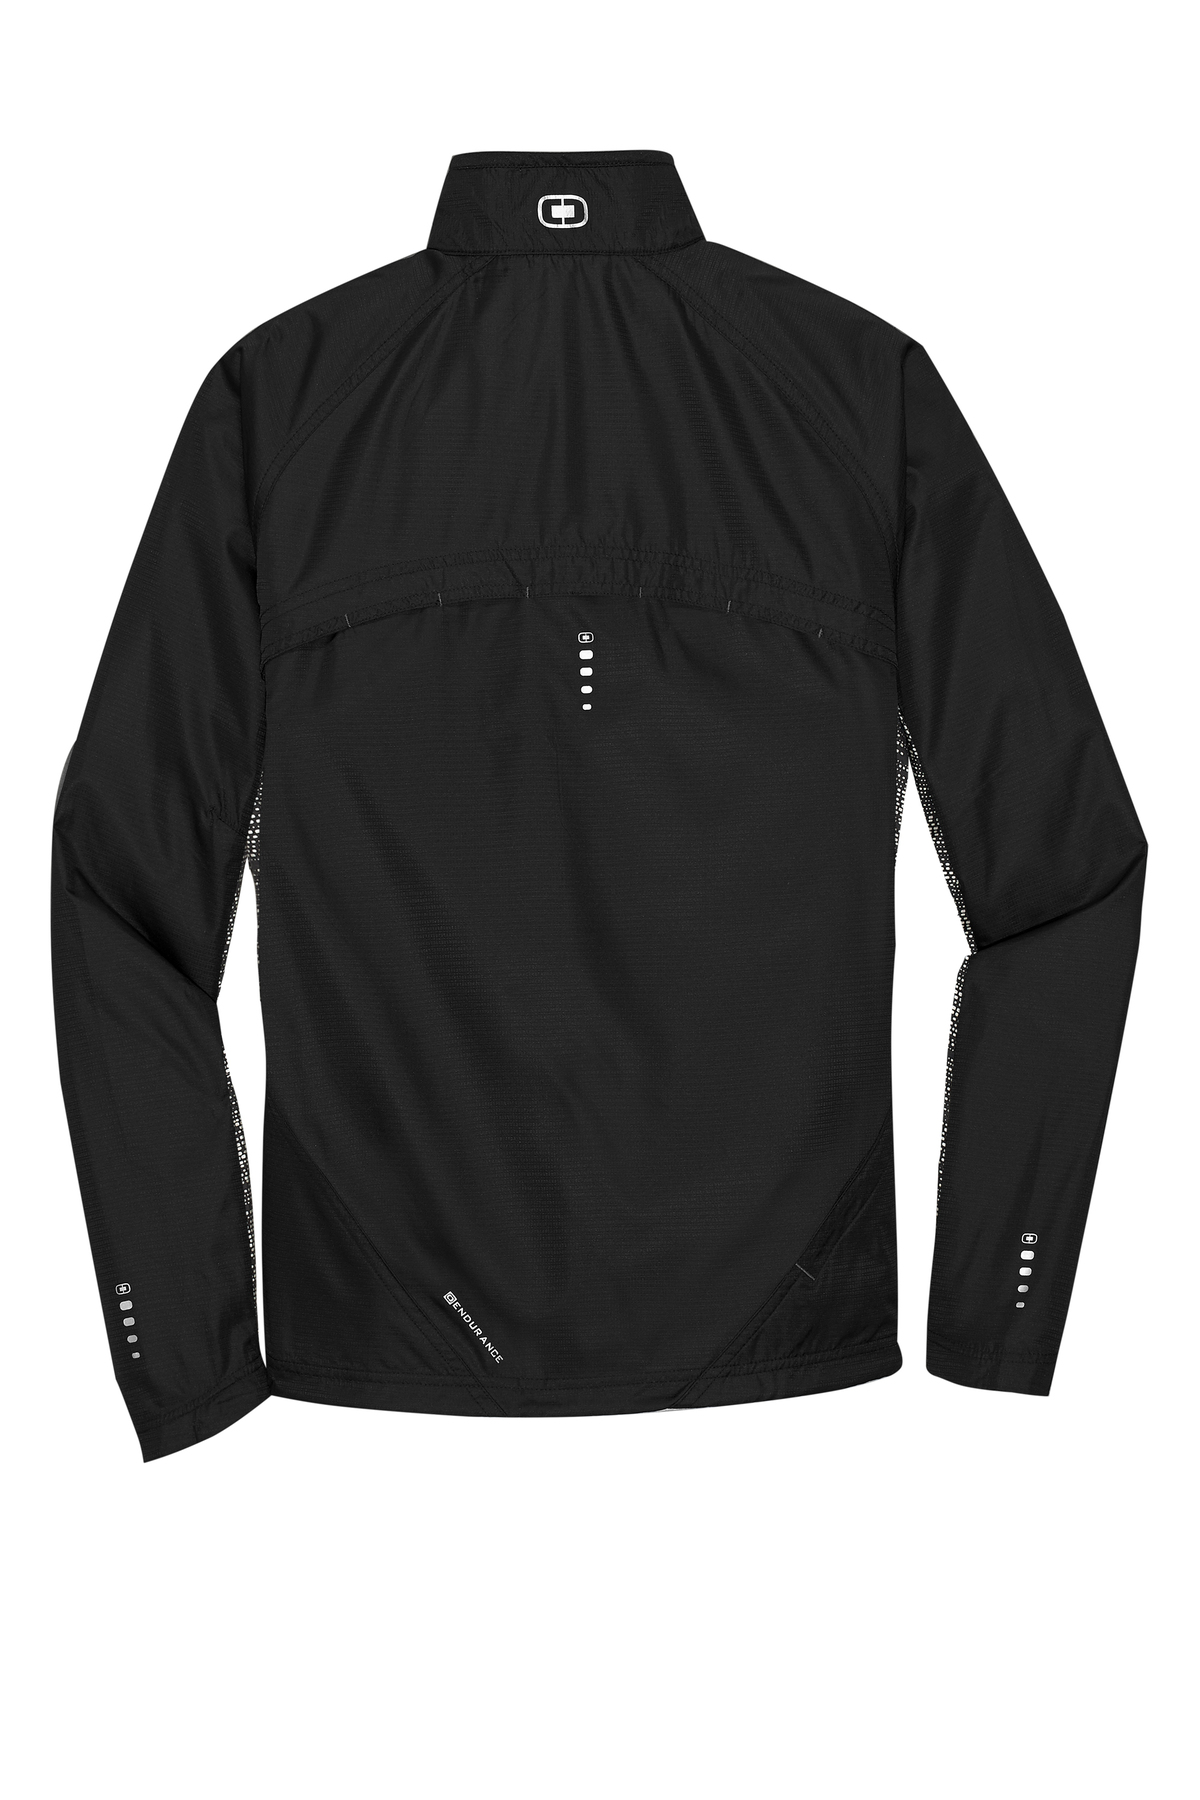 ogio174 endurance trainer jacket soft shells outerwear